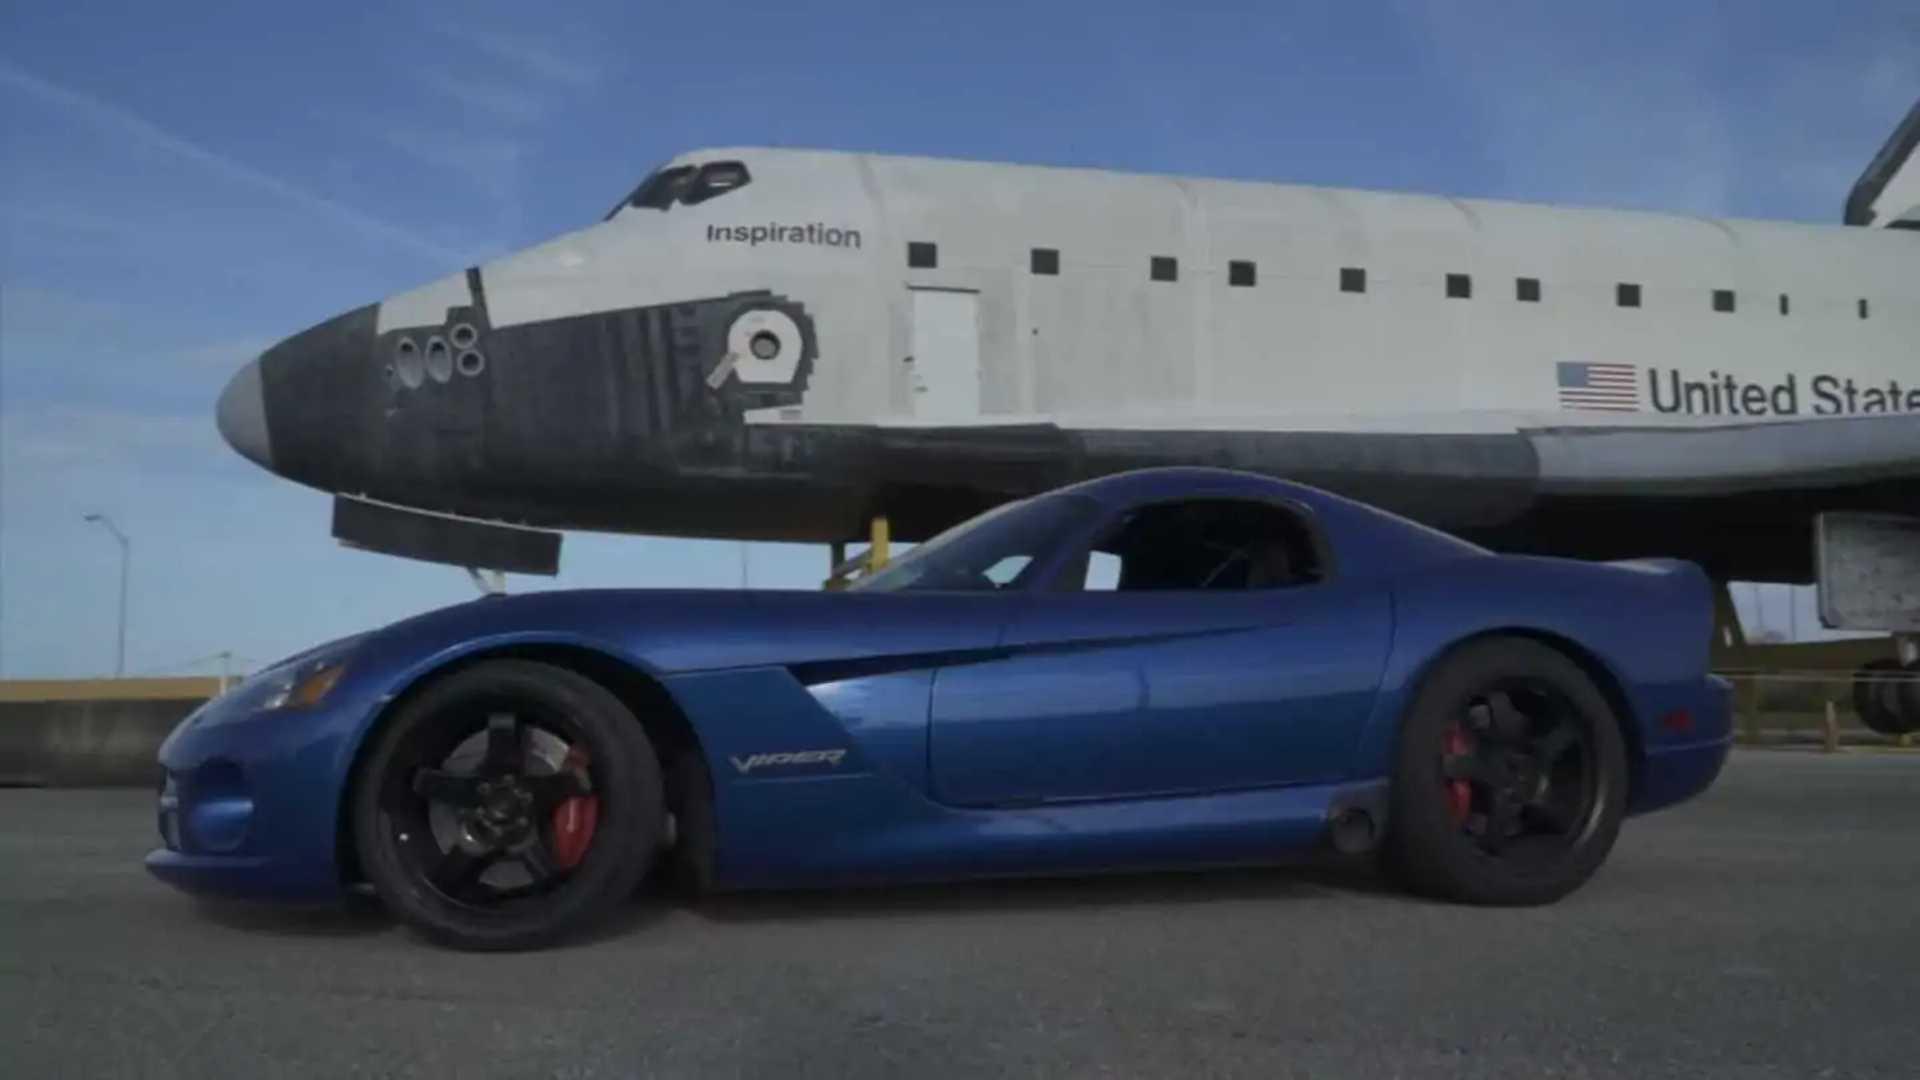 See 1,400-HP Dodge Viper Blast Beyond 250 MPH In Record Speed Run